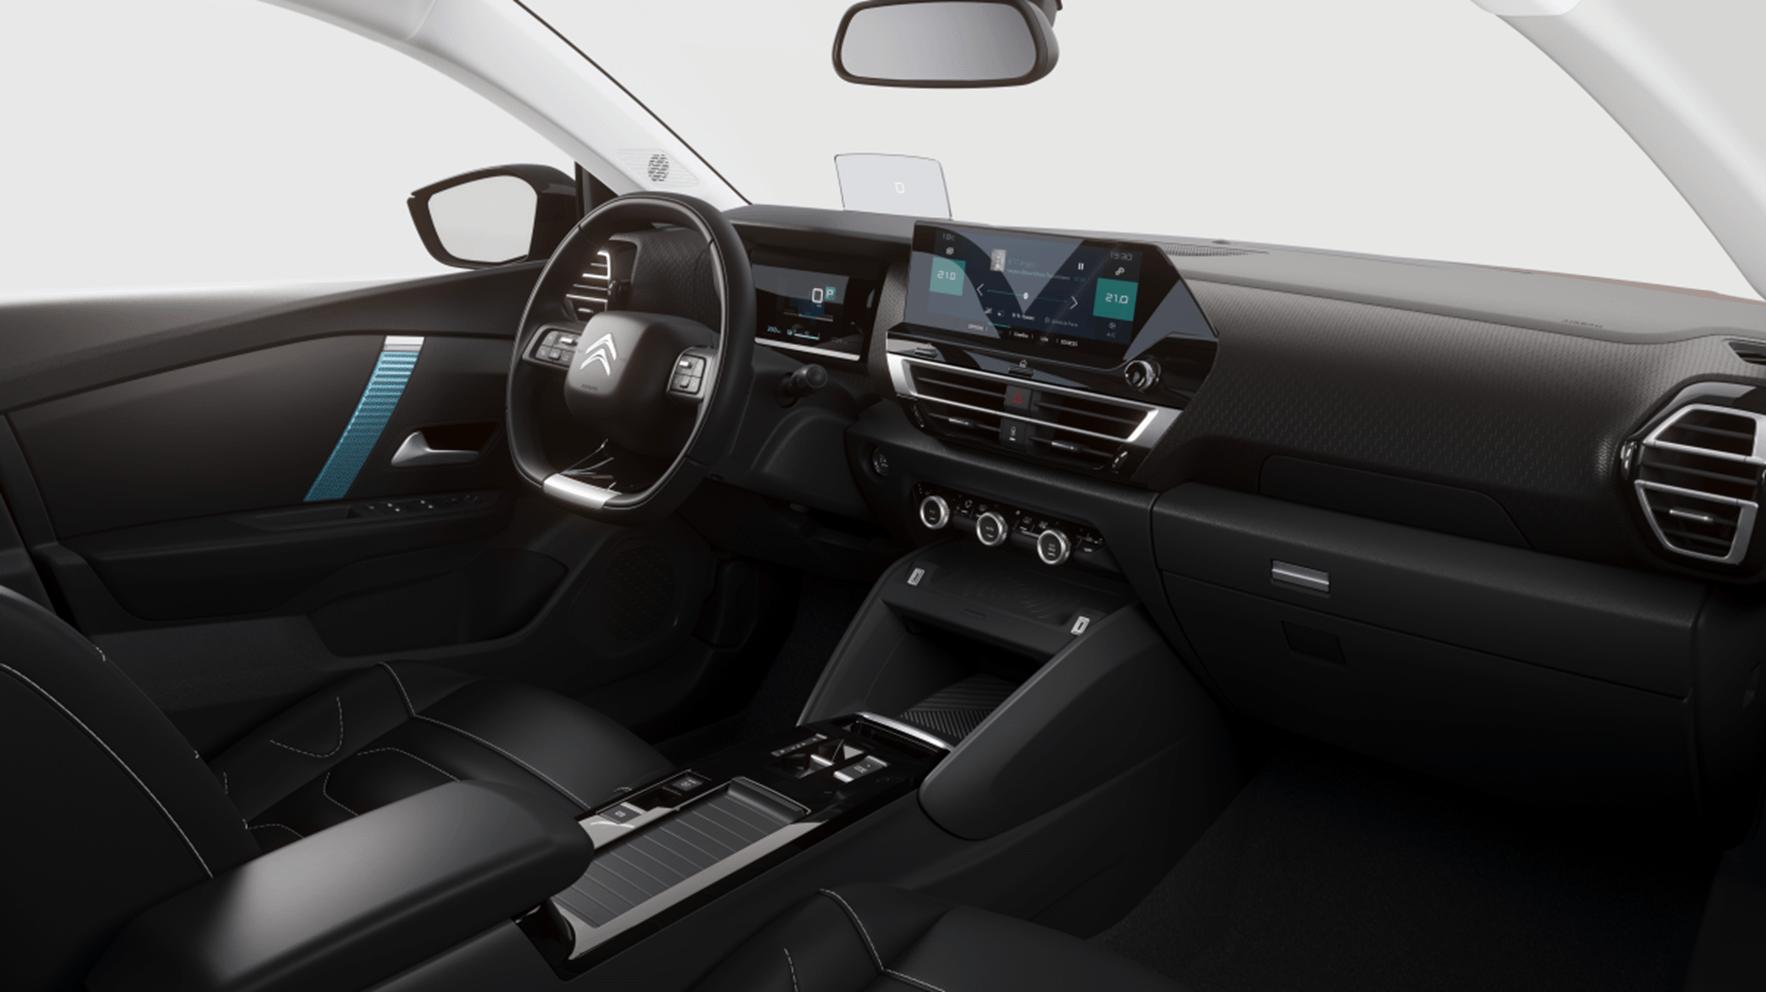 New Citroën C4 and ë-C4